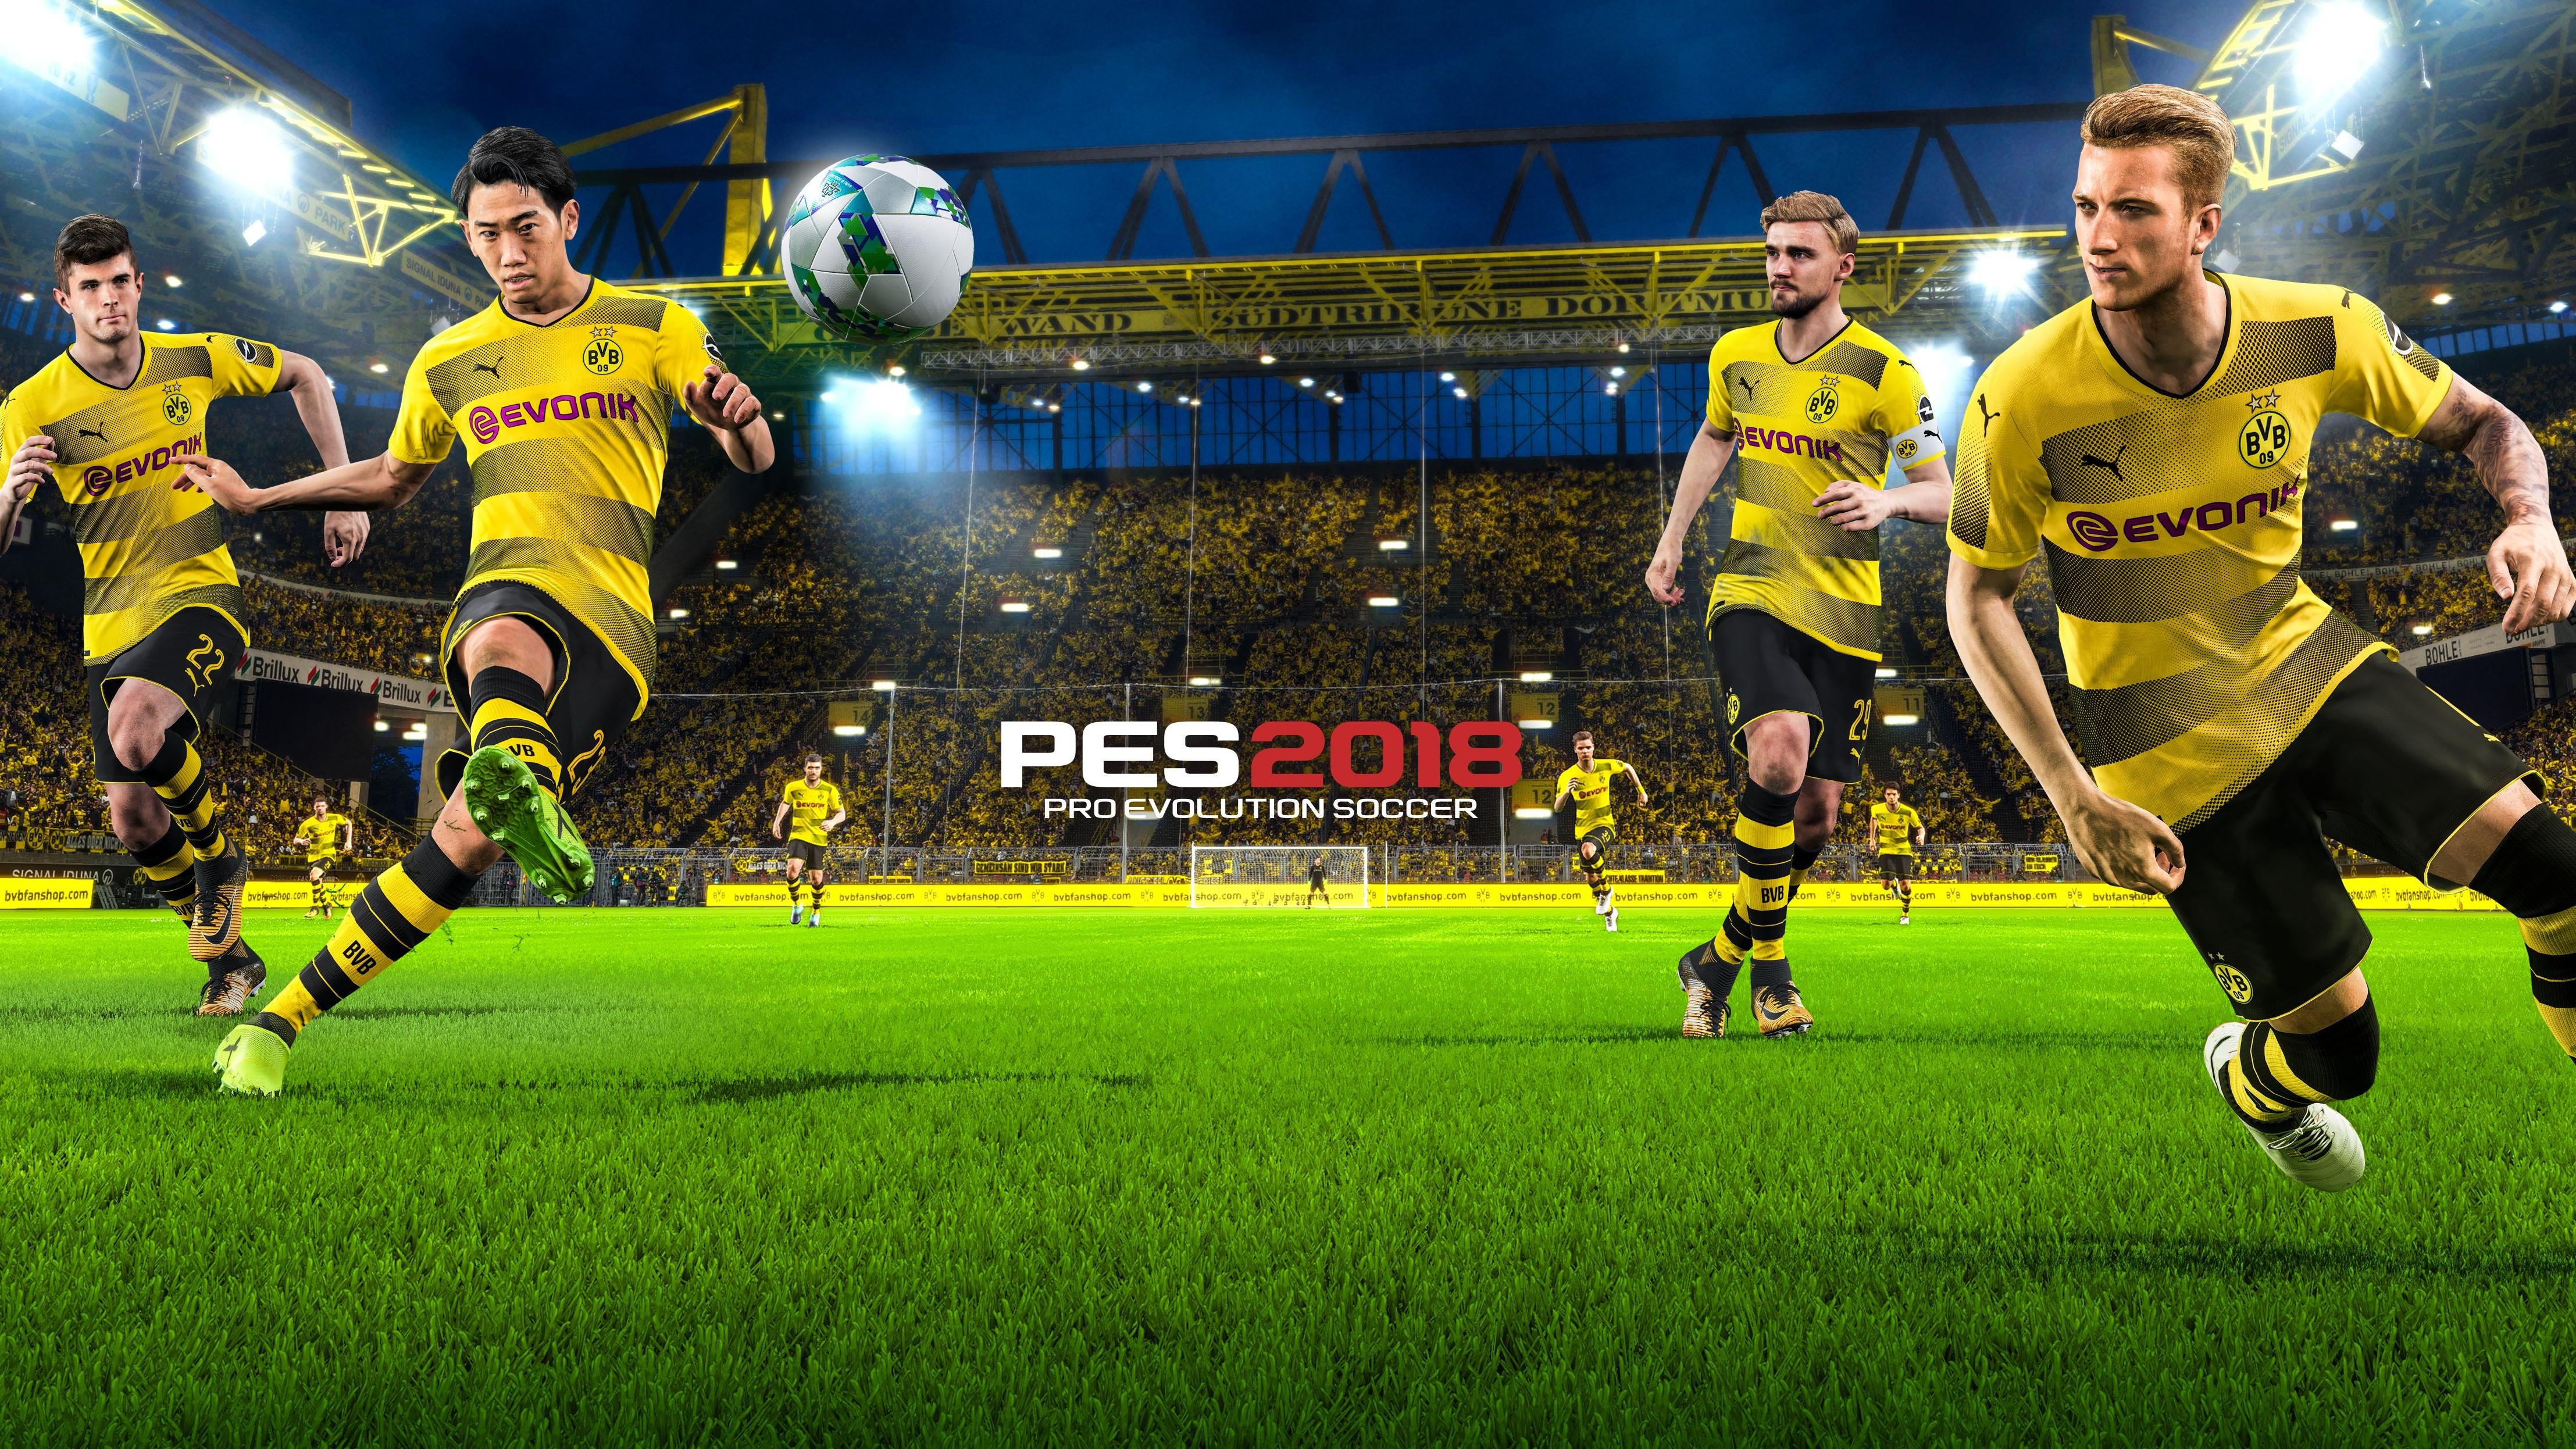 Soccer Wallpapers Backgrounds Pro: Pro Evolution Soccer 2018 4k, HD Games, 4k Wallpapers